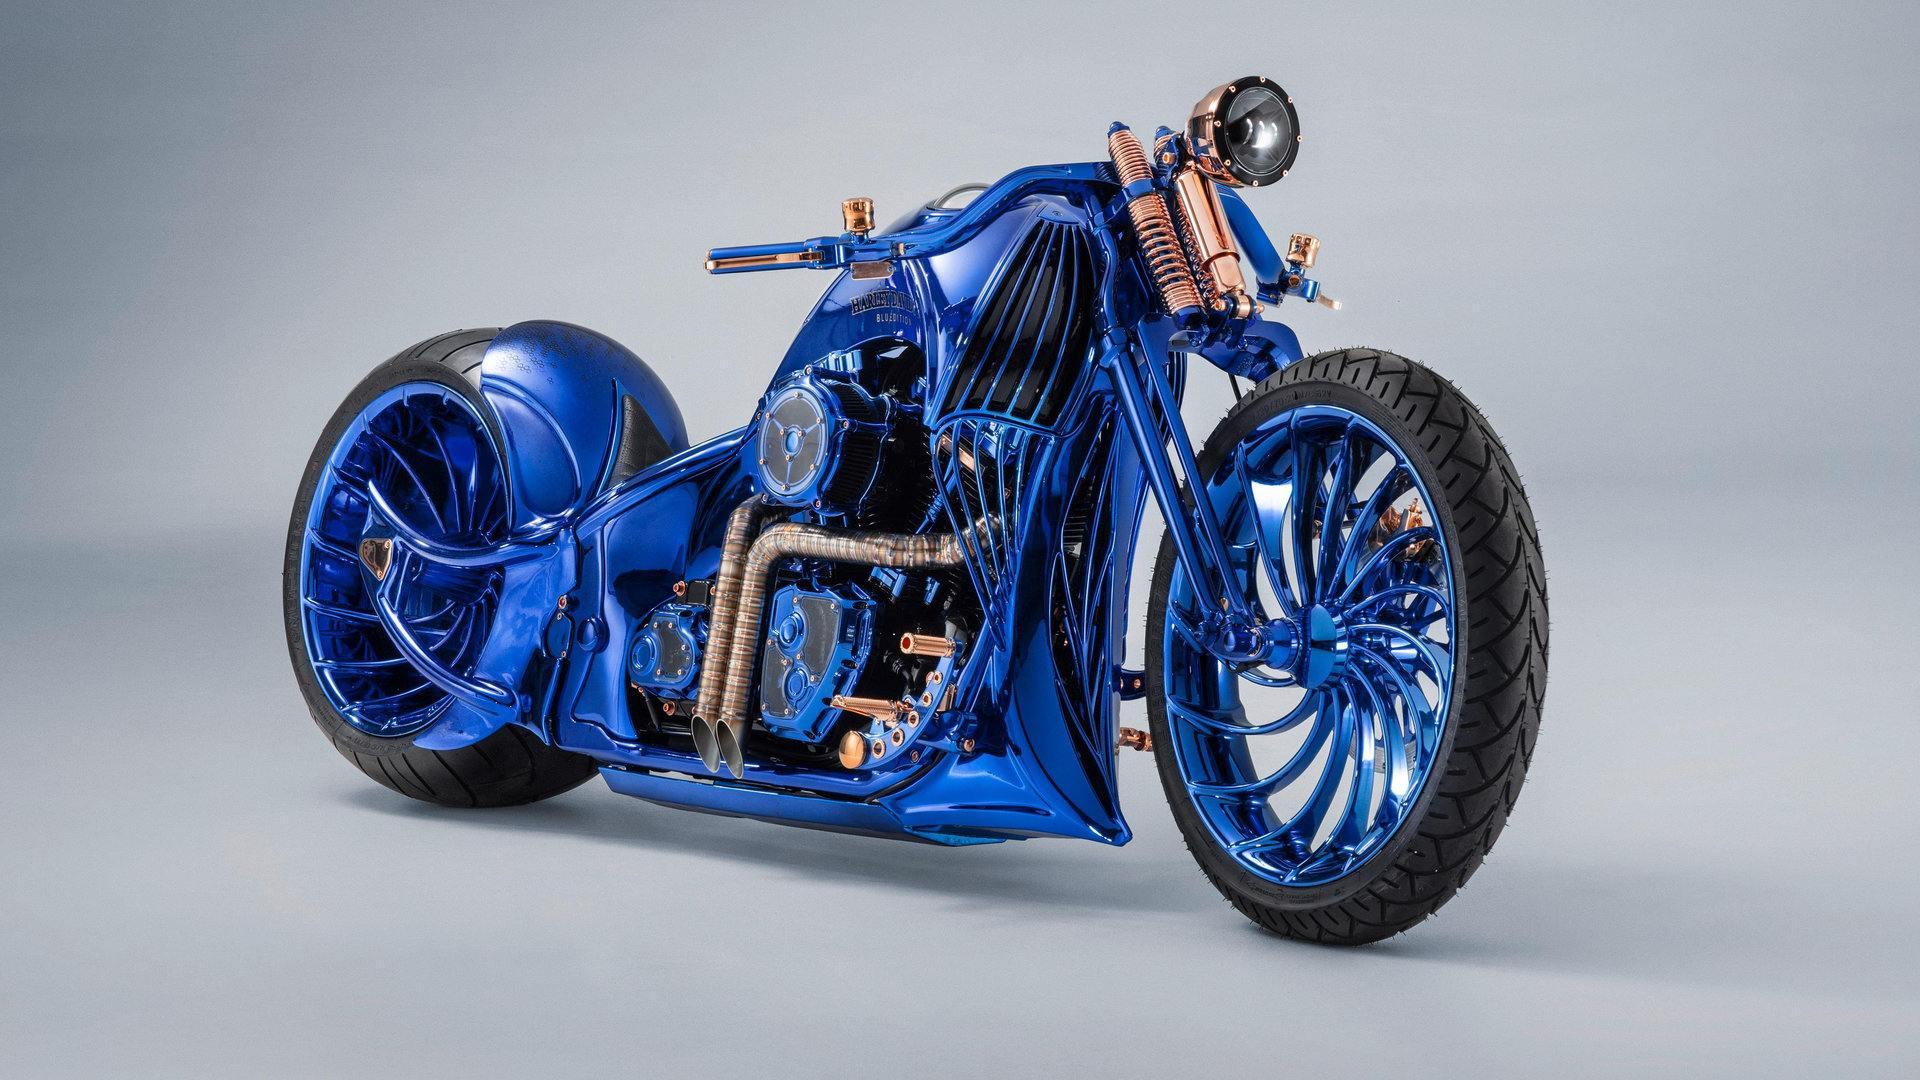 Harley Davidson Bucherer Blue Edition 2